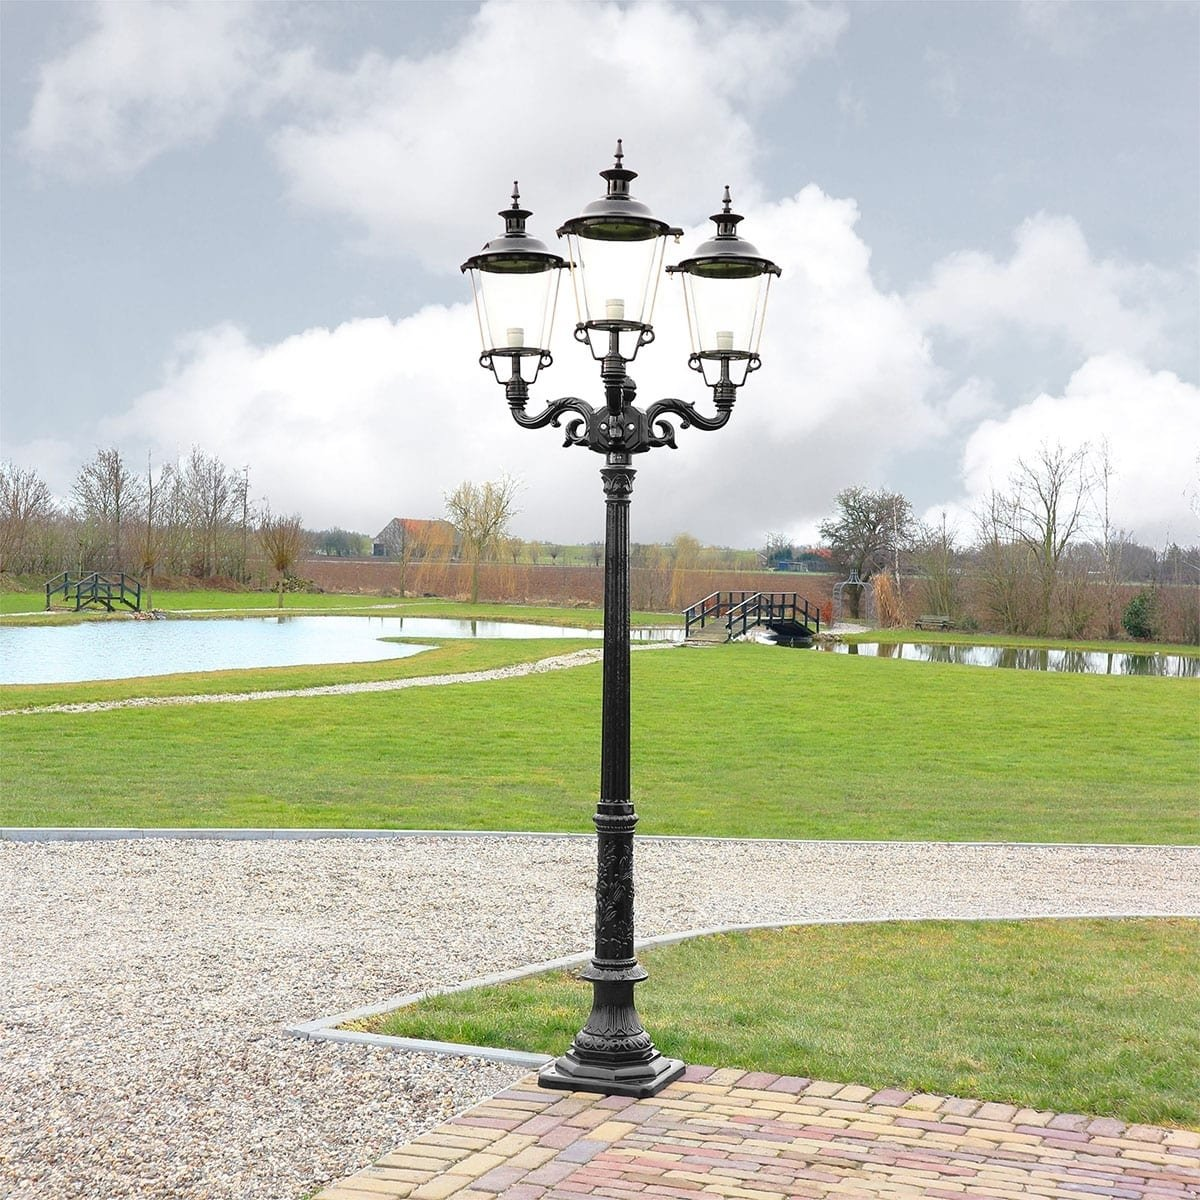 Outdoor Lighting Classic Rural Garden lantern antique Britsum 3-arms - 261 cm